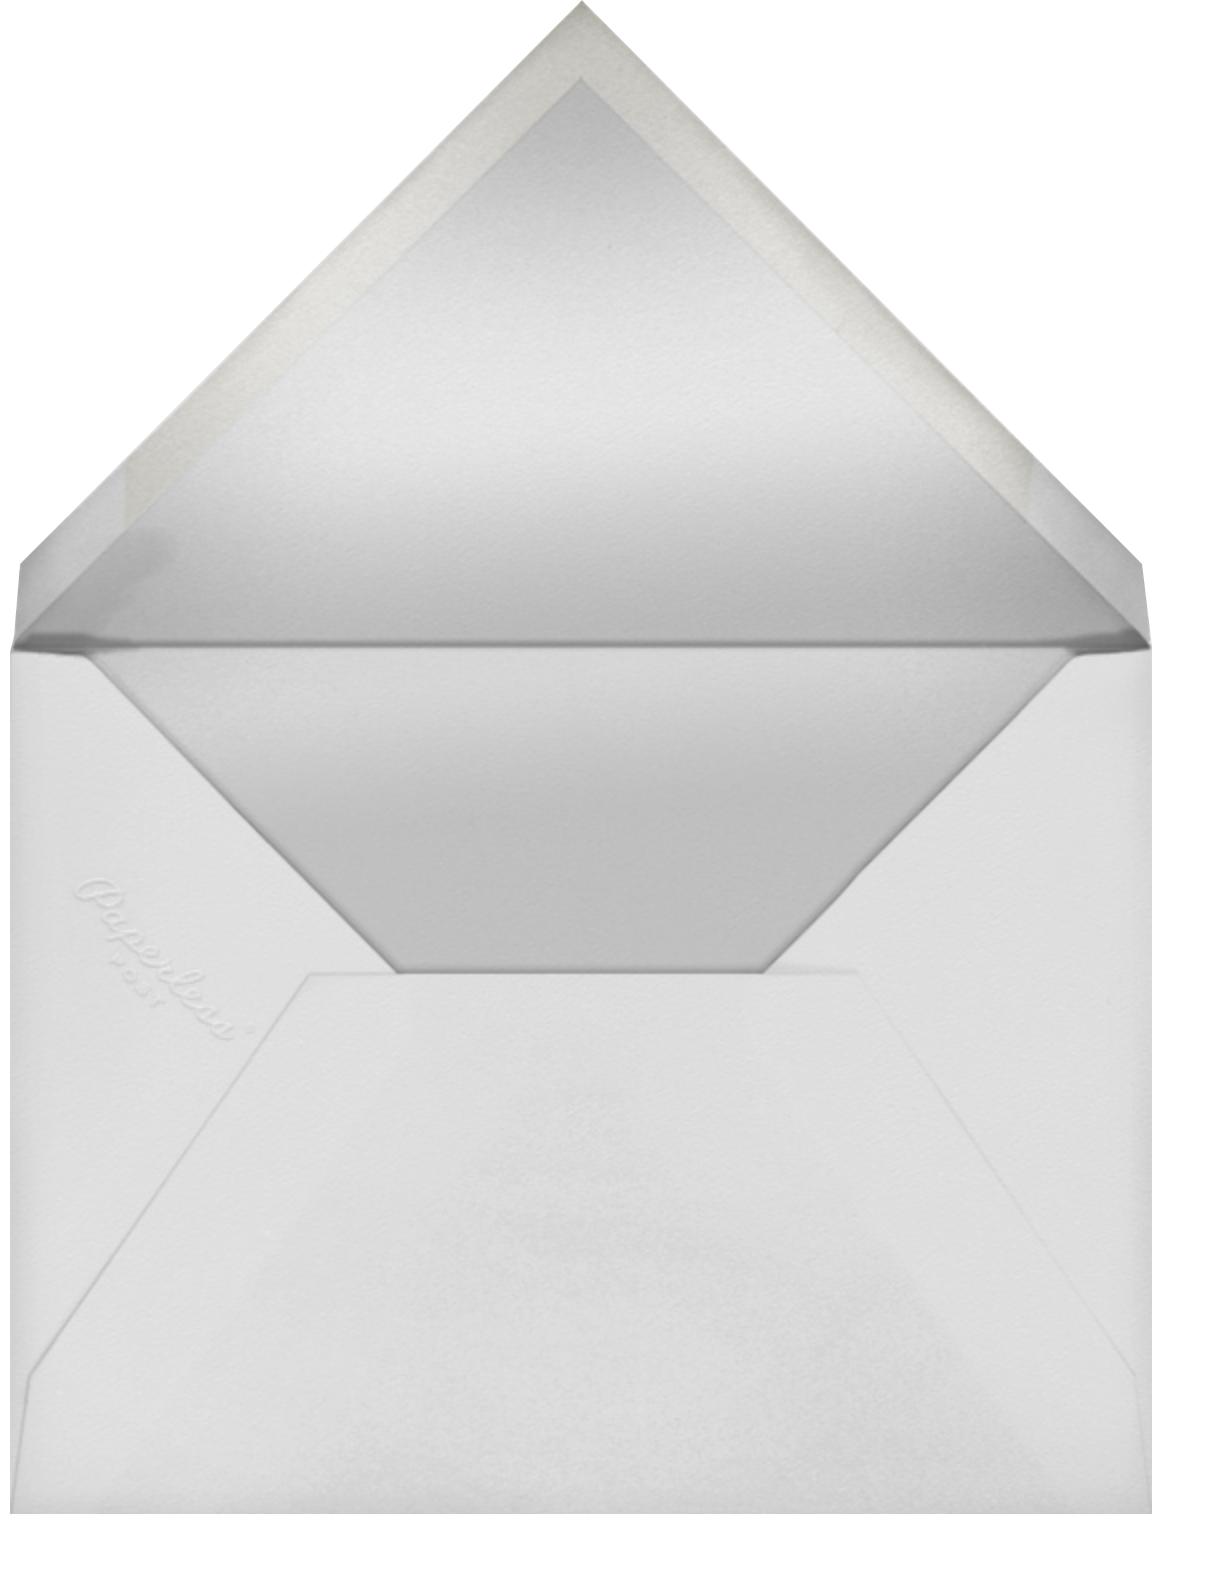 Horizontal Photo on Tall (Menu) - Paperless Post - Menus - envelope back